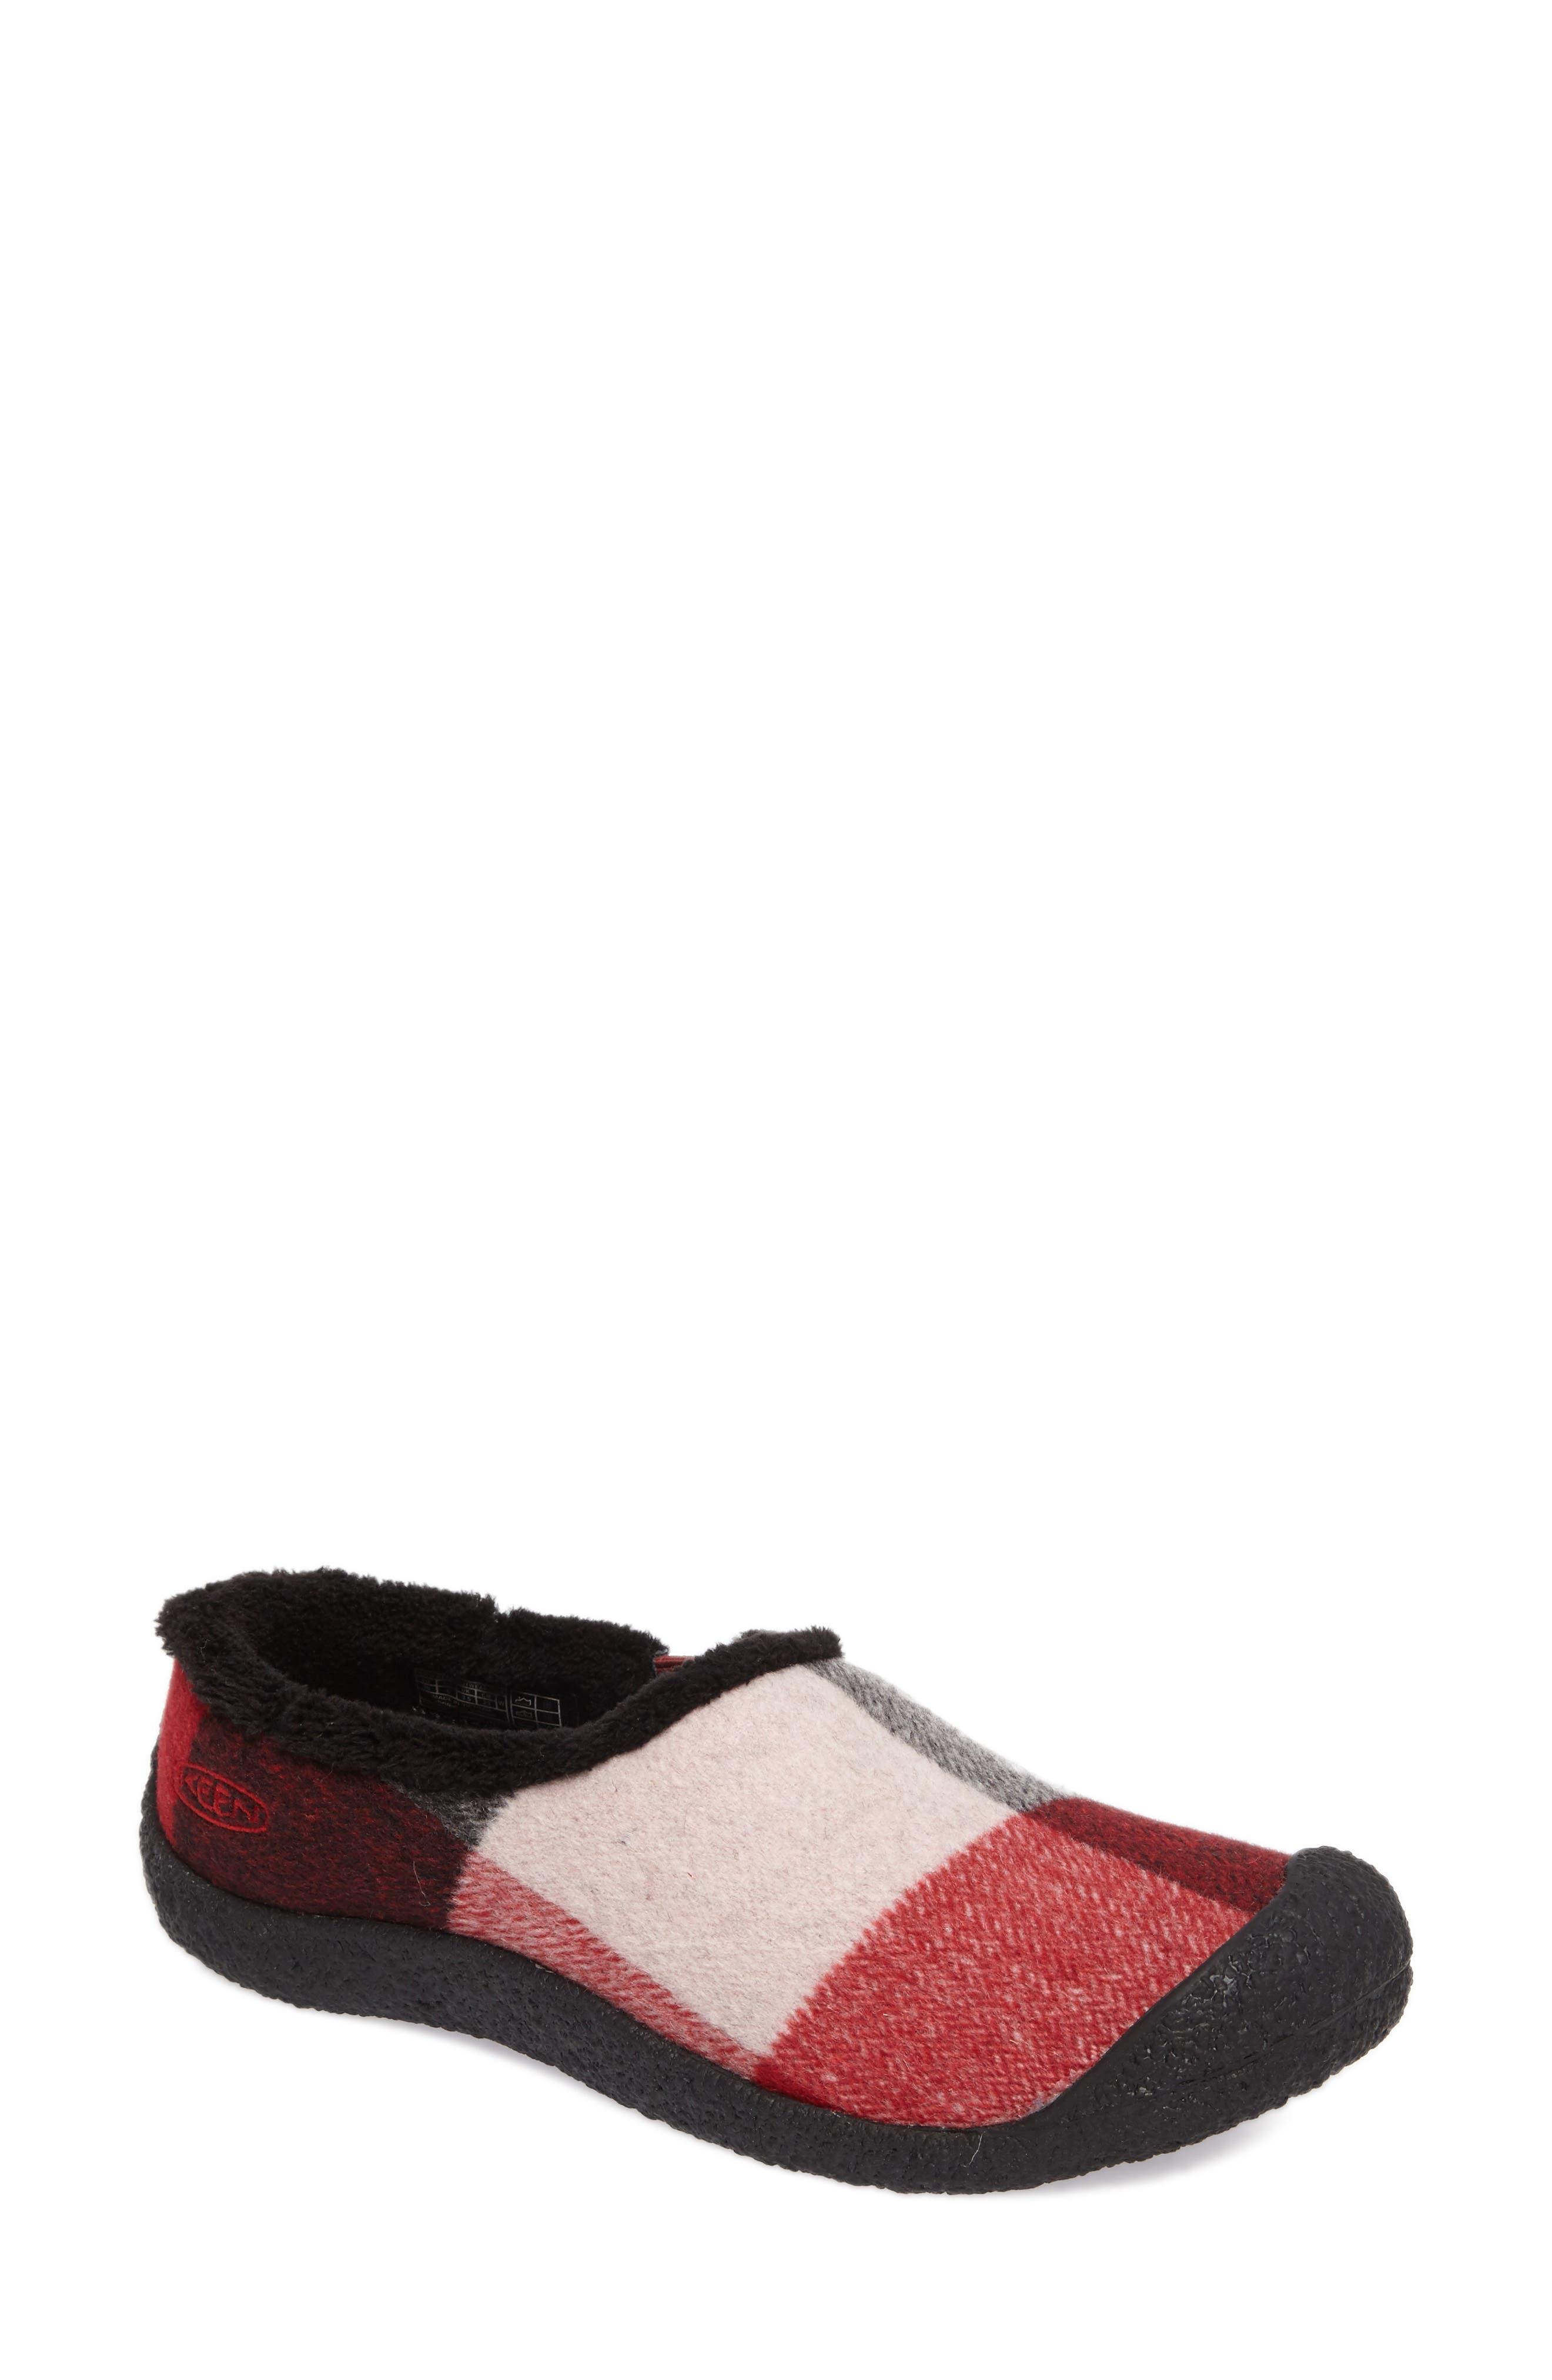 Alternate Image 1 Selected - Keen Howser Round Toe Wool Slip-on (Women)